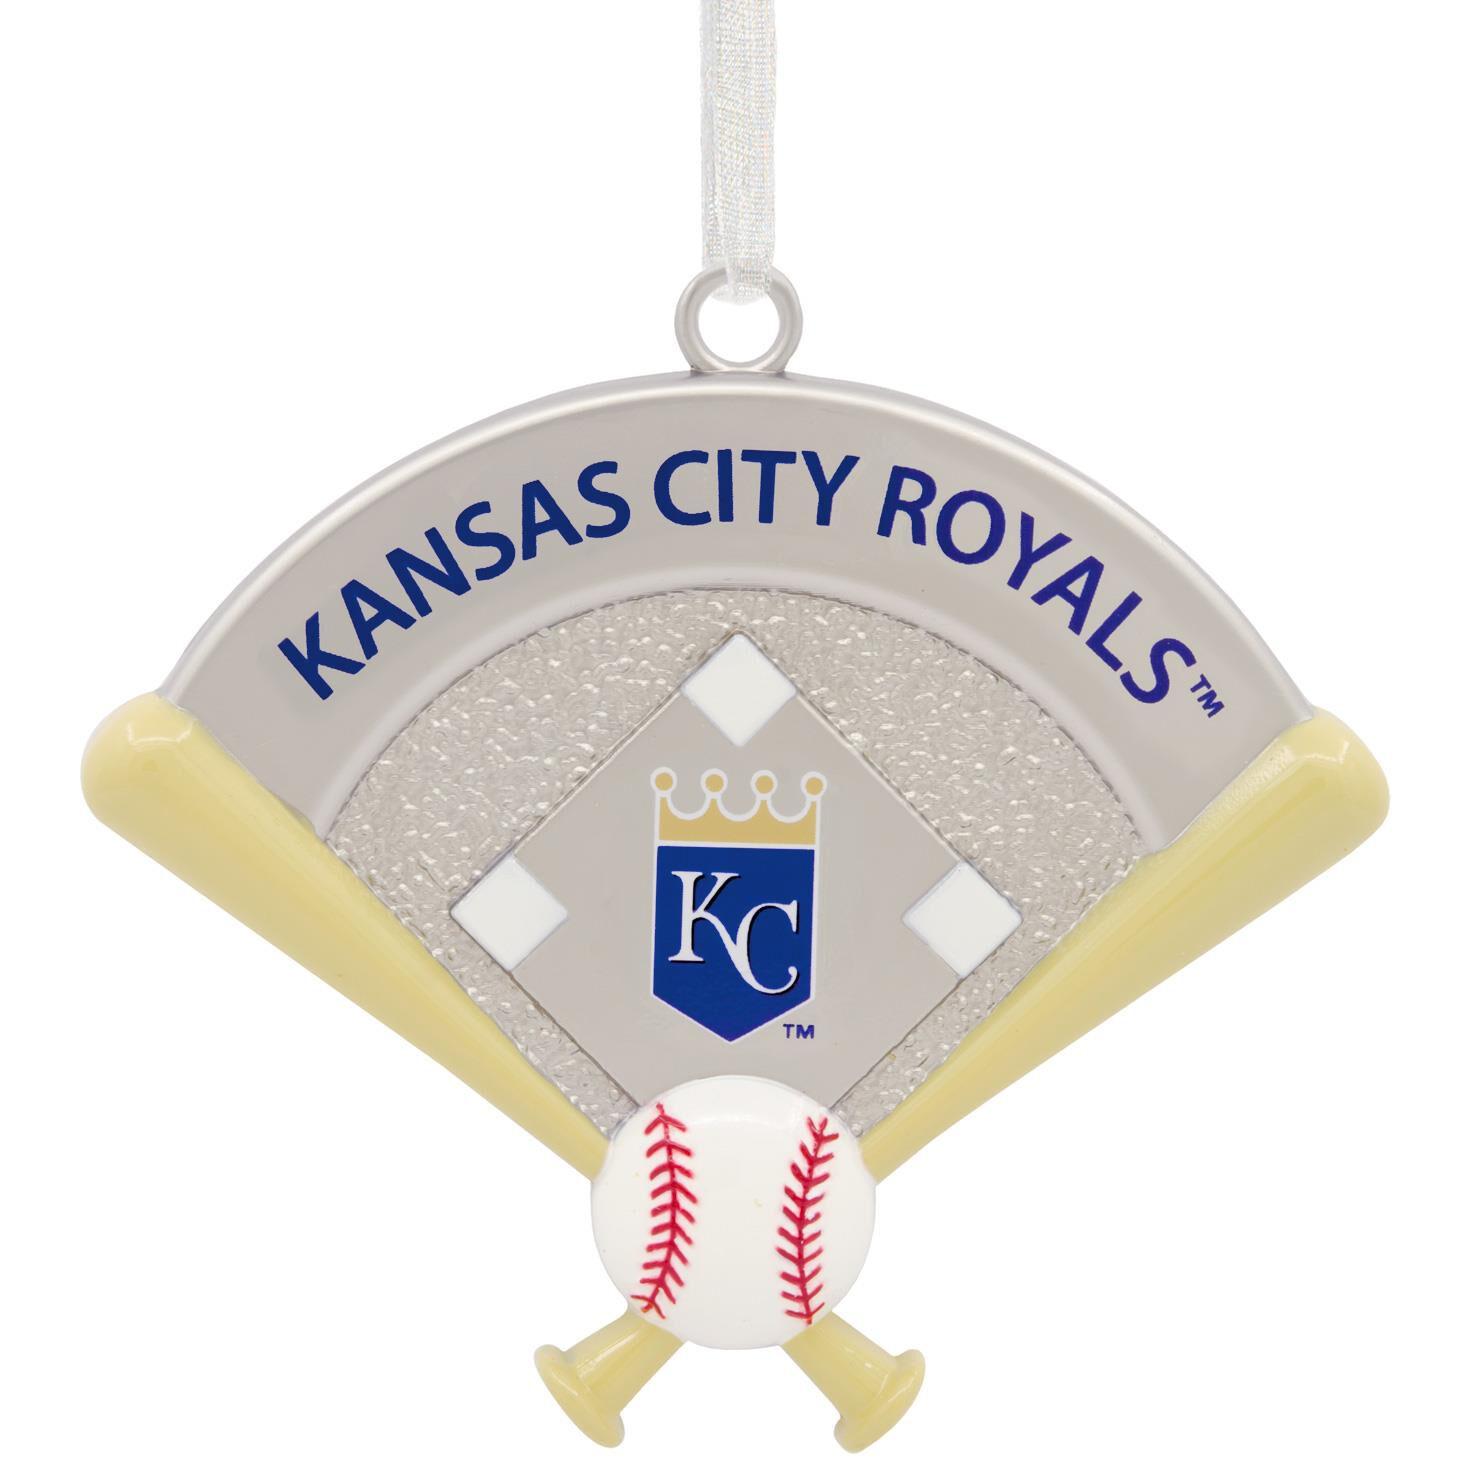 MLB Kansas City Royals™ Metal Hallmark Ornament - Gift Ornaments ...